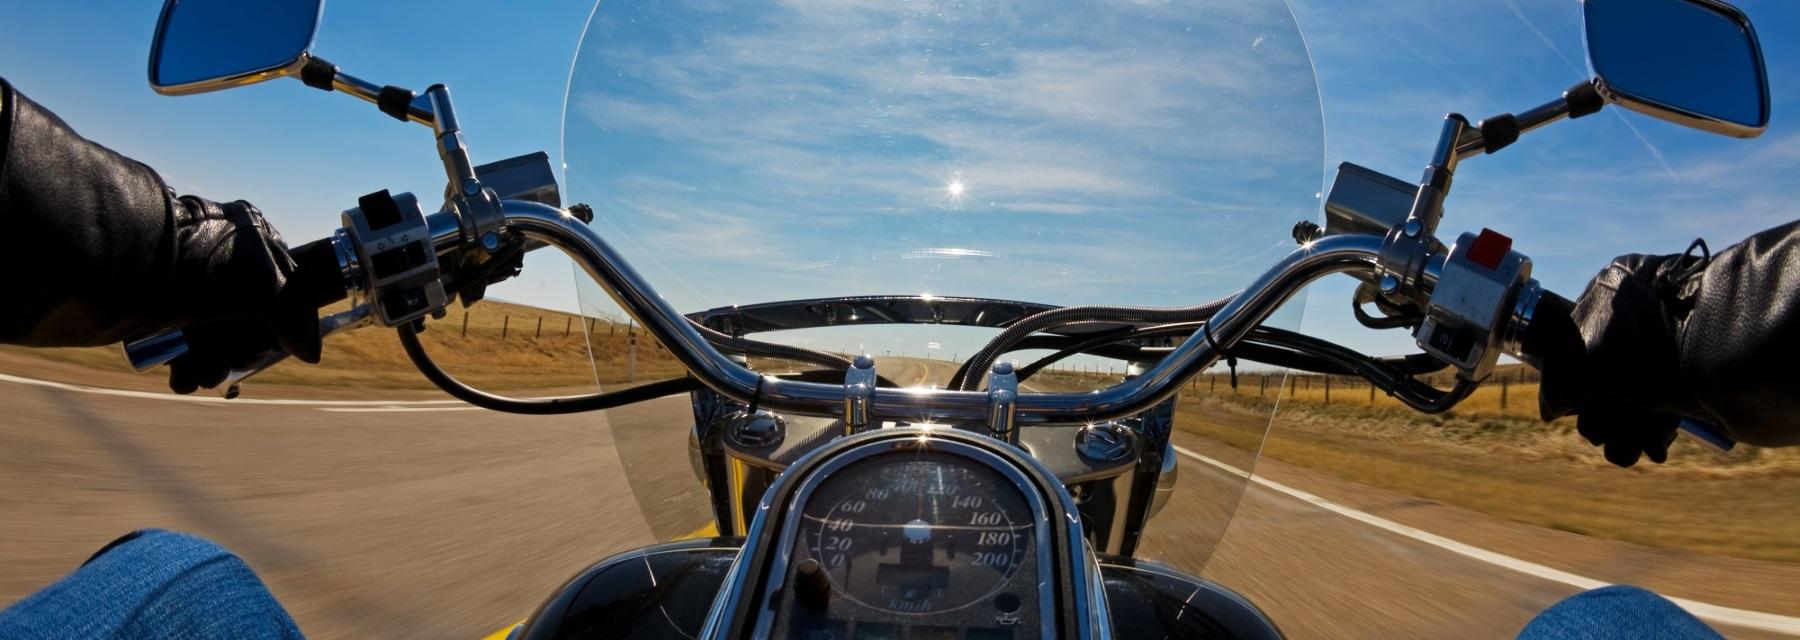 Auto, Car, Home, Business, Life, Health Insurance in Omaha Nebraska ...